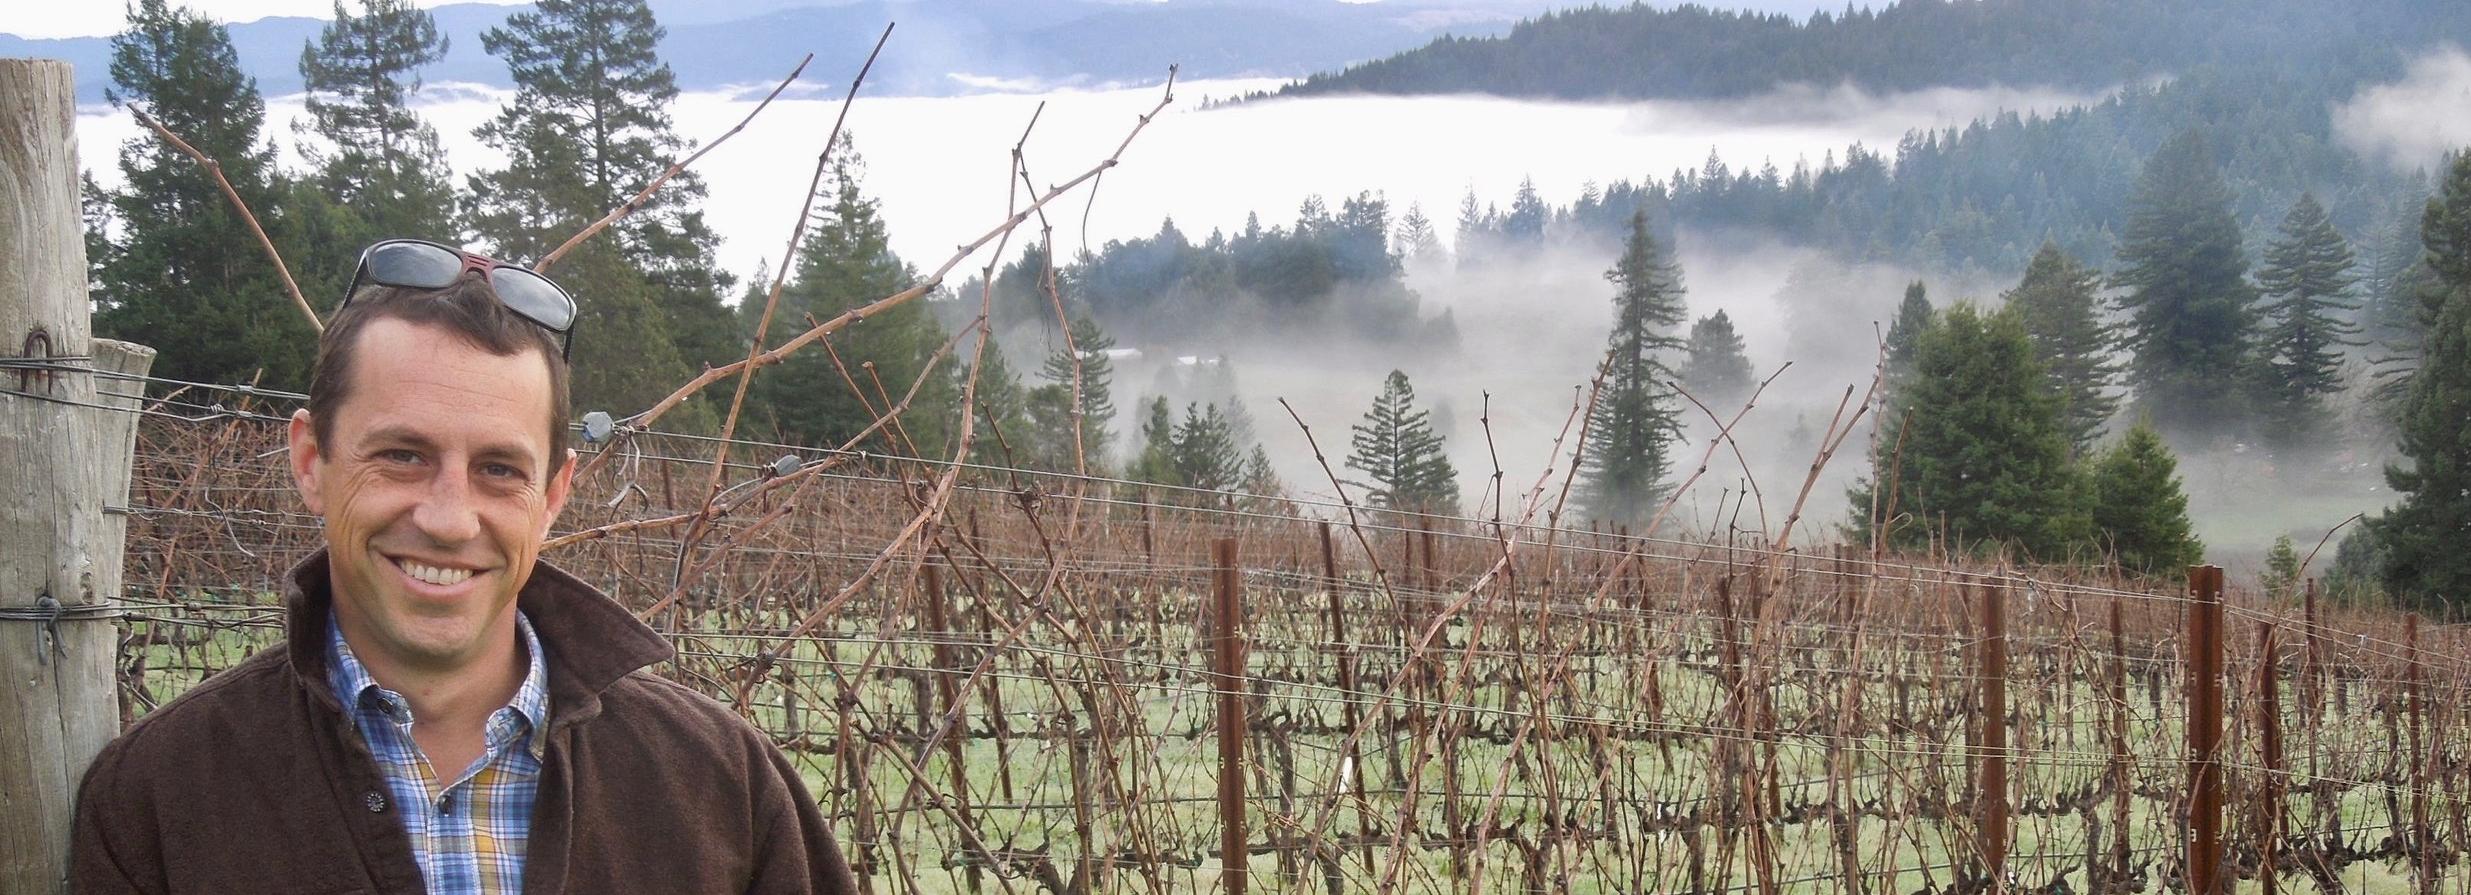 Phillip T G Baxter vineyard high res correct light.jpg